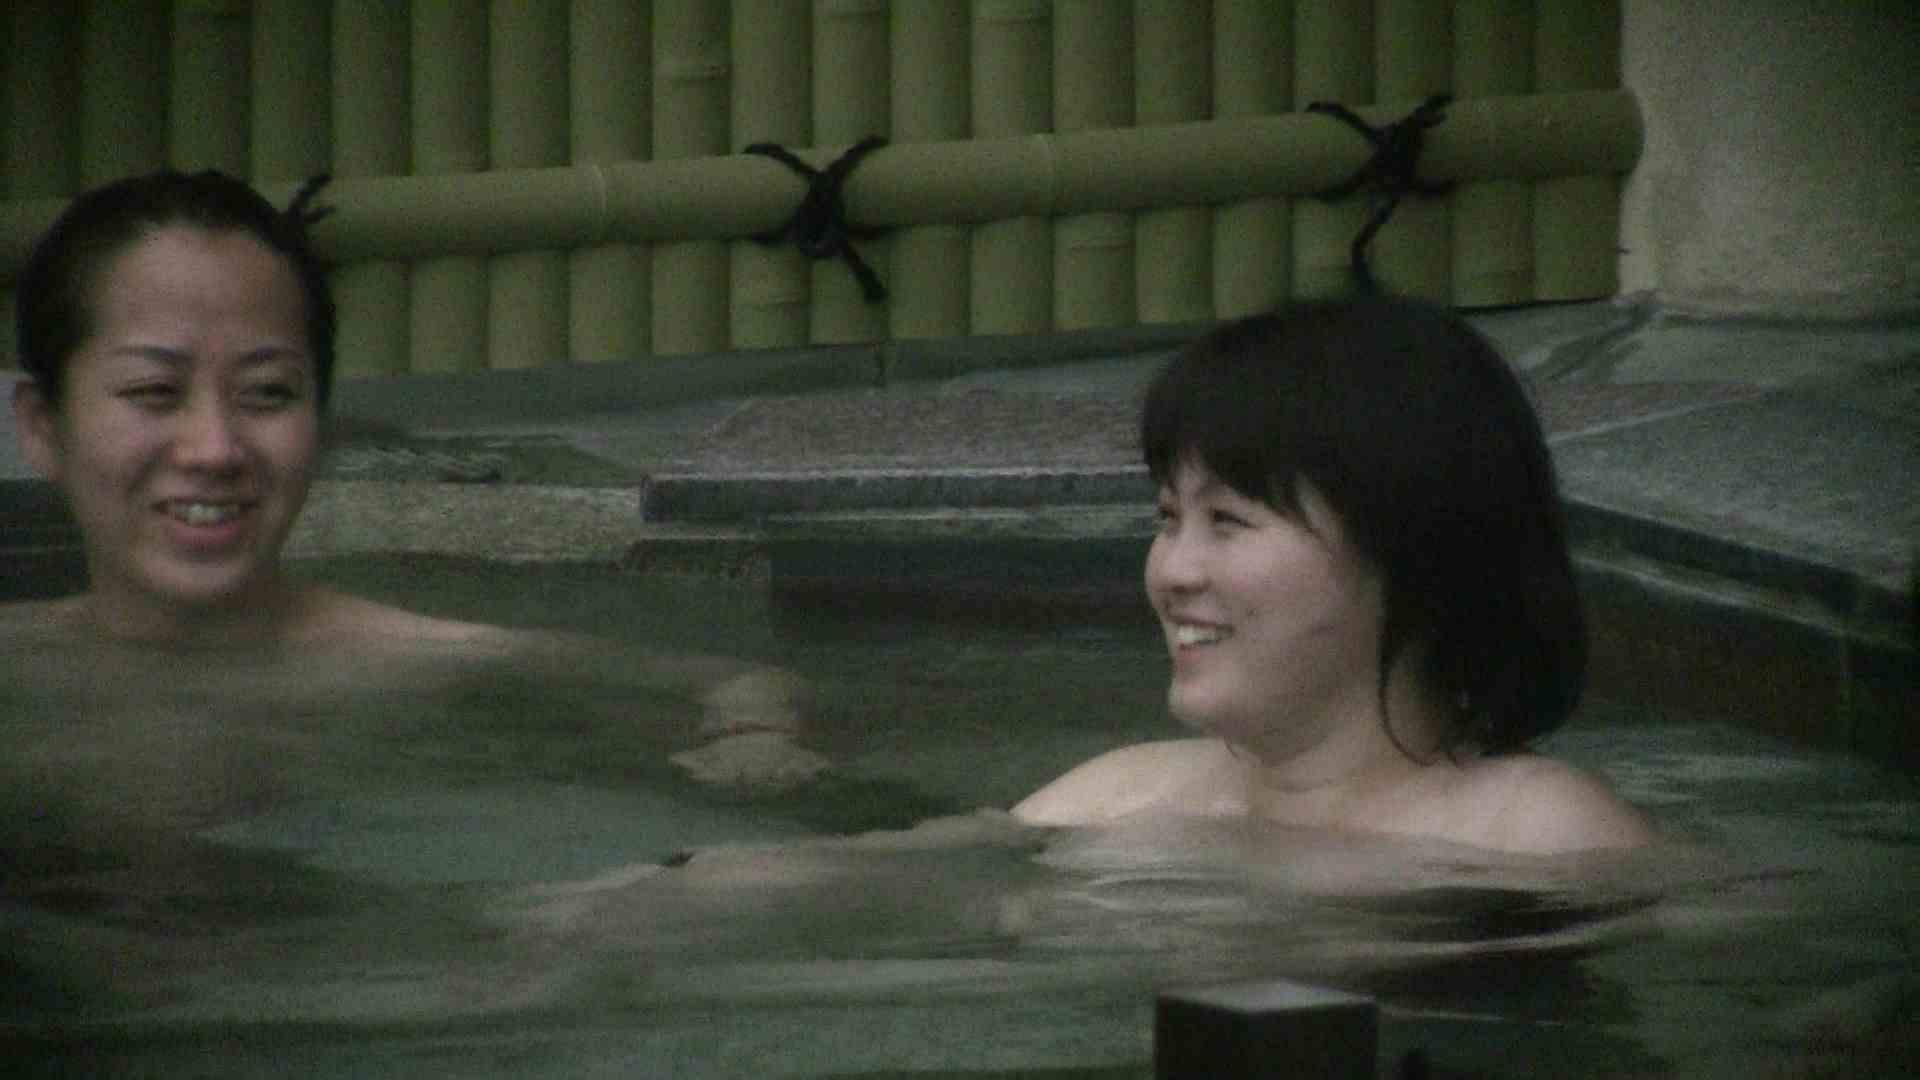 Aquaな露天風呂Vol.539 盗撮  62pic 58